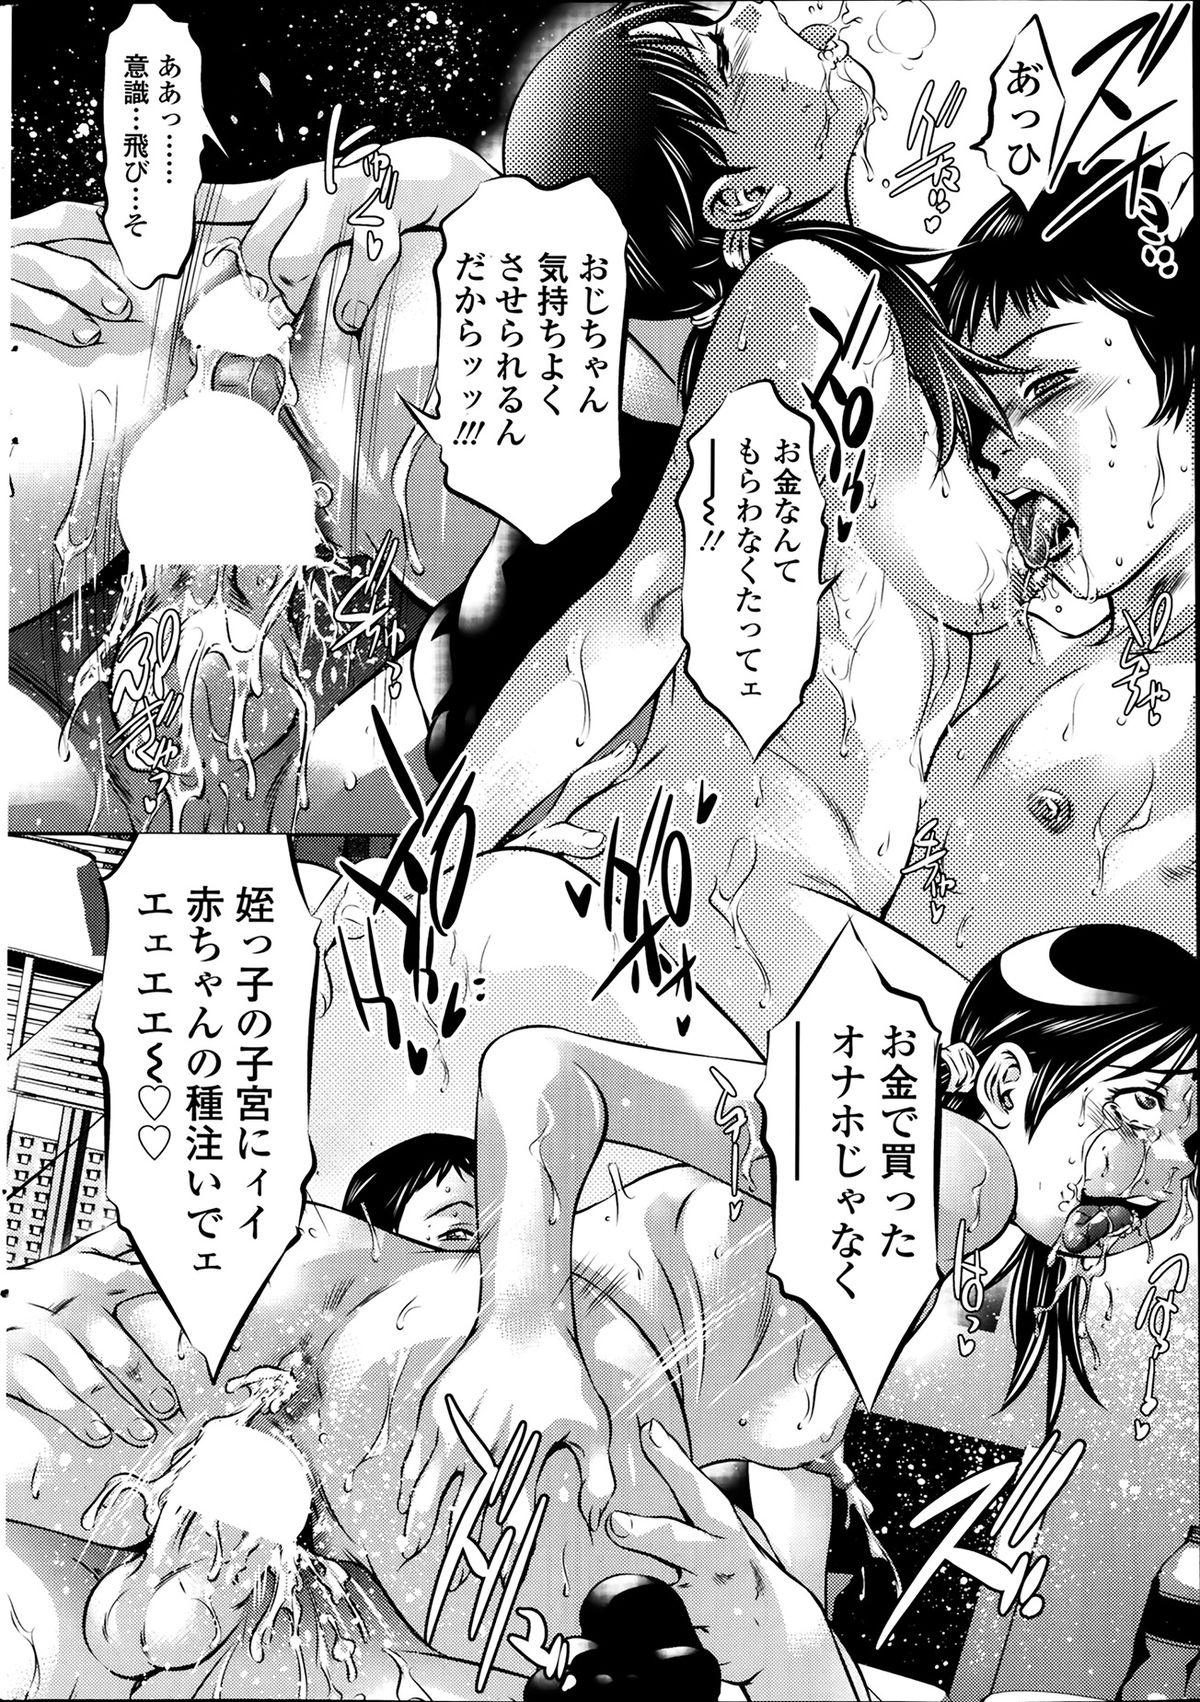 COMIC SIGMA 2014-03 Vol.78 260